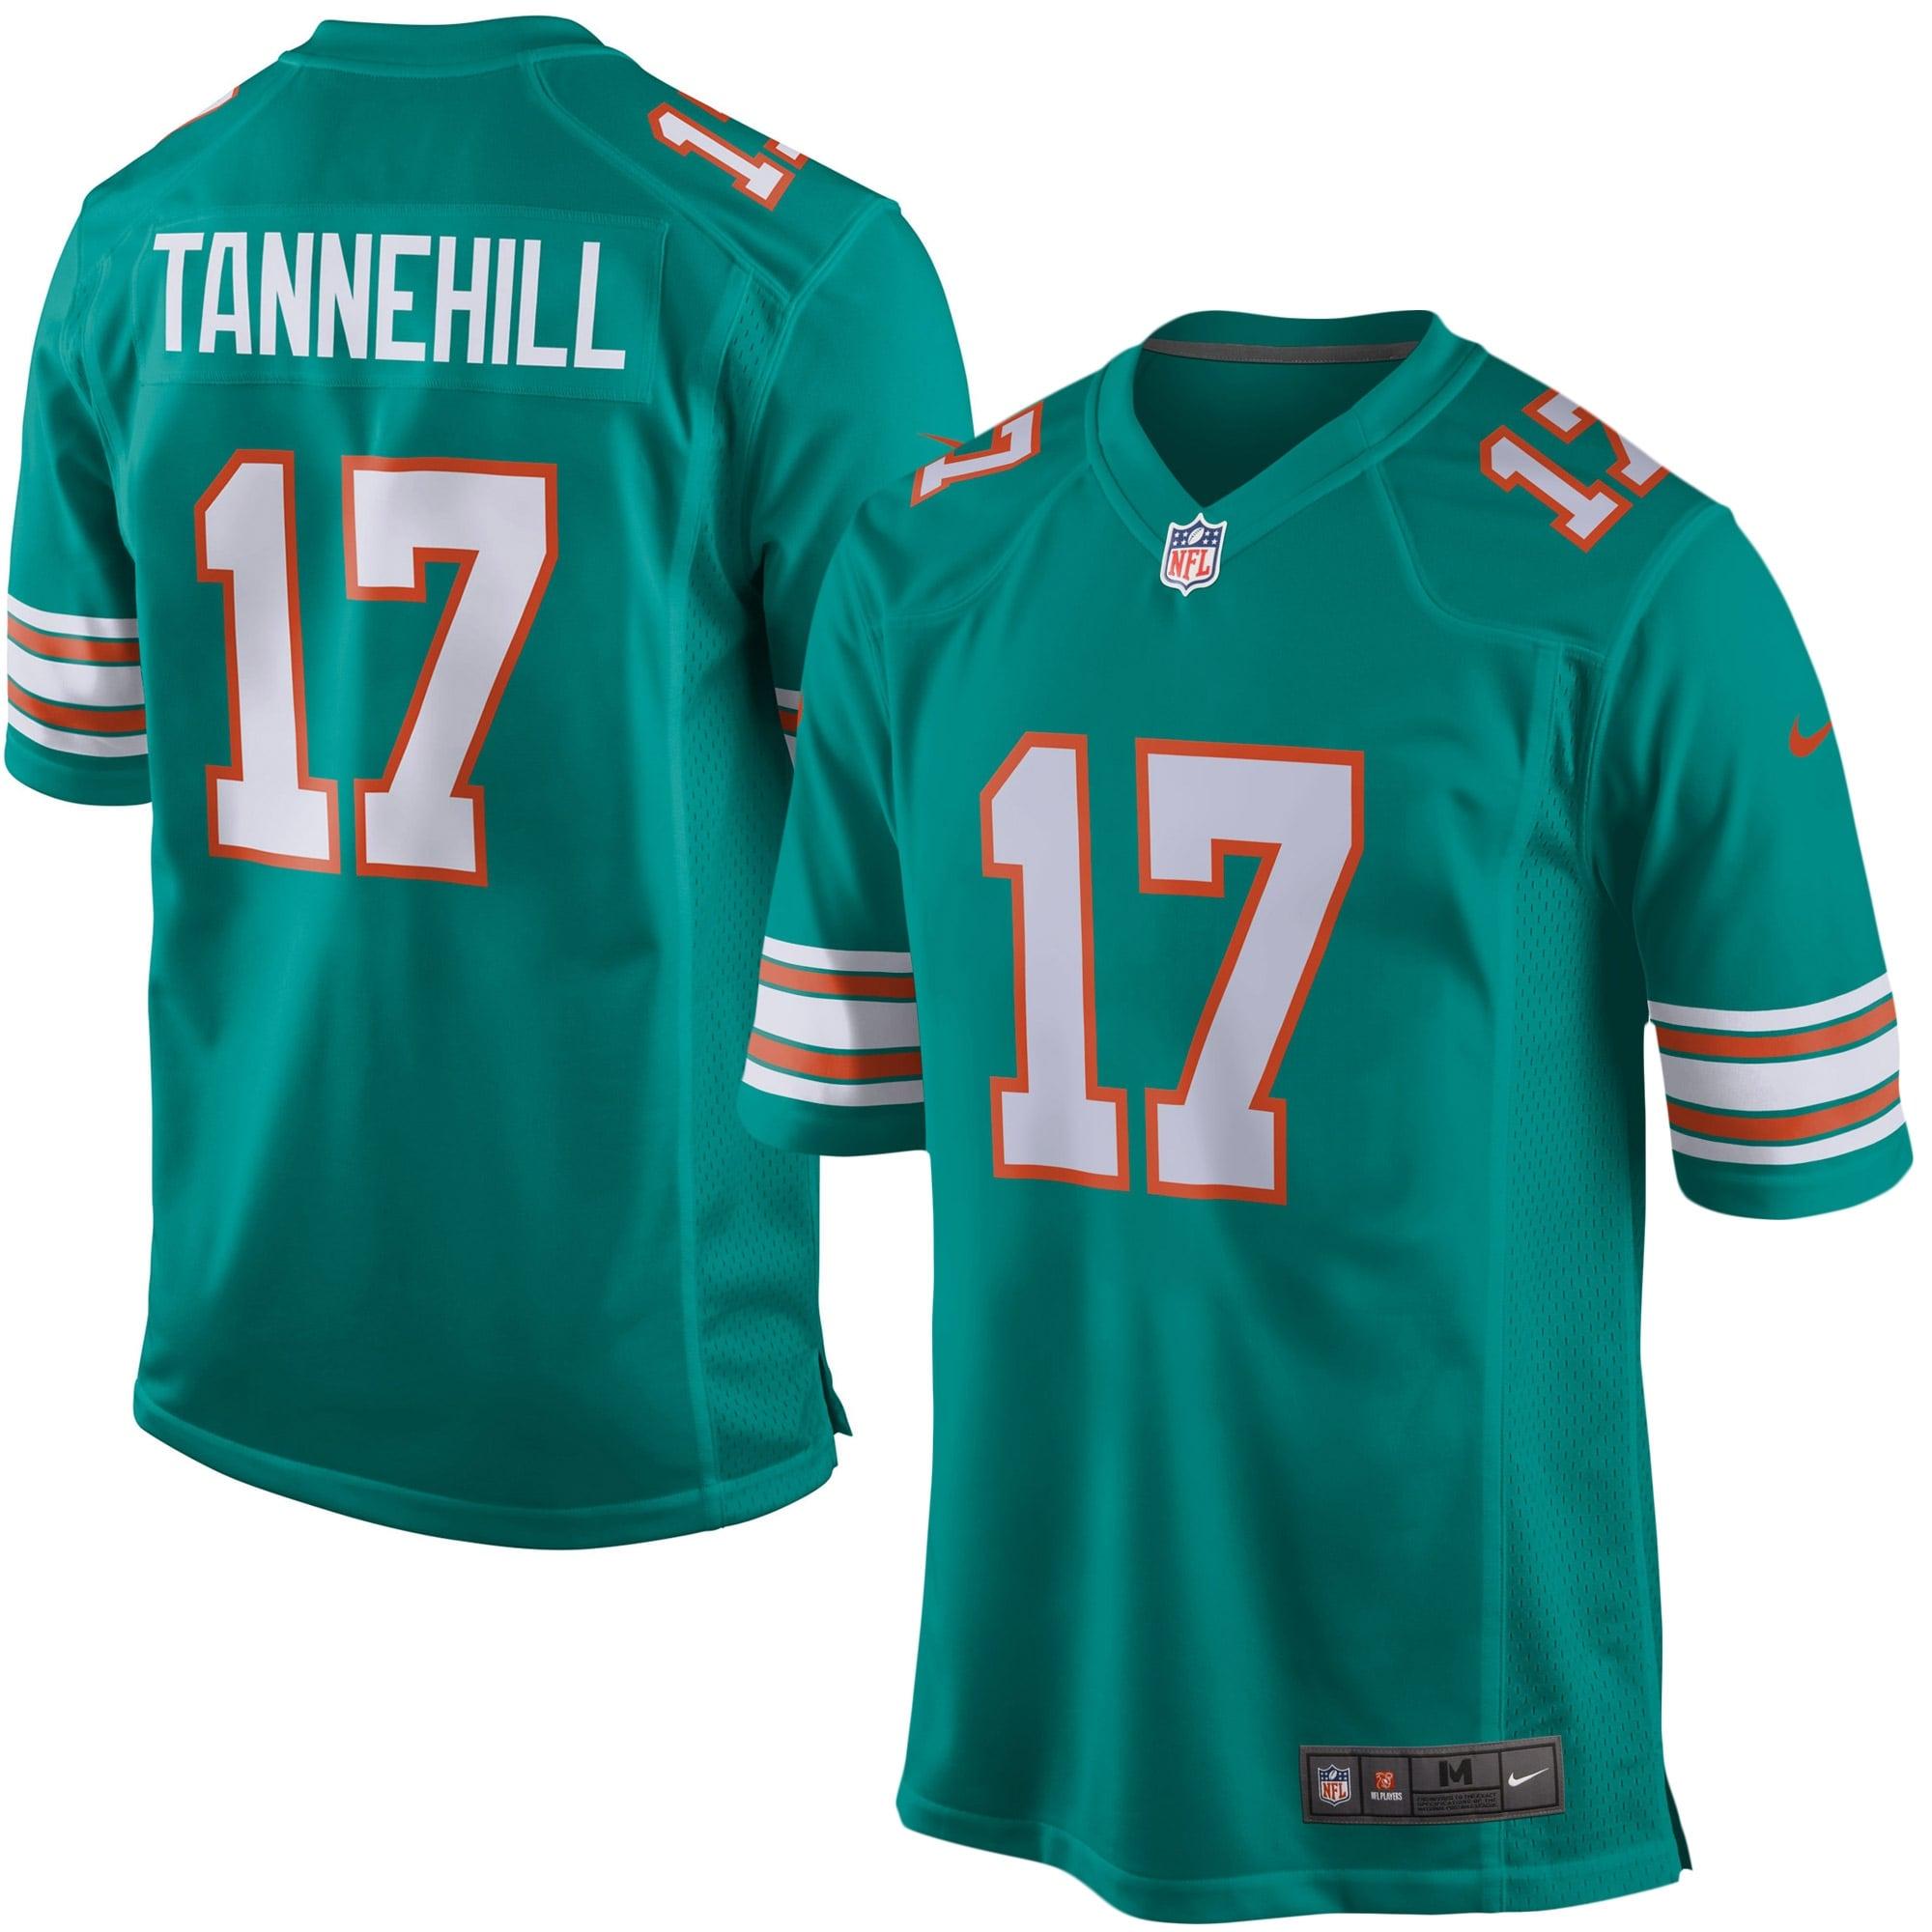 Ryan Tannehill Miami Dolphins Nike Youth Alternate Game Jersey - Aqua